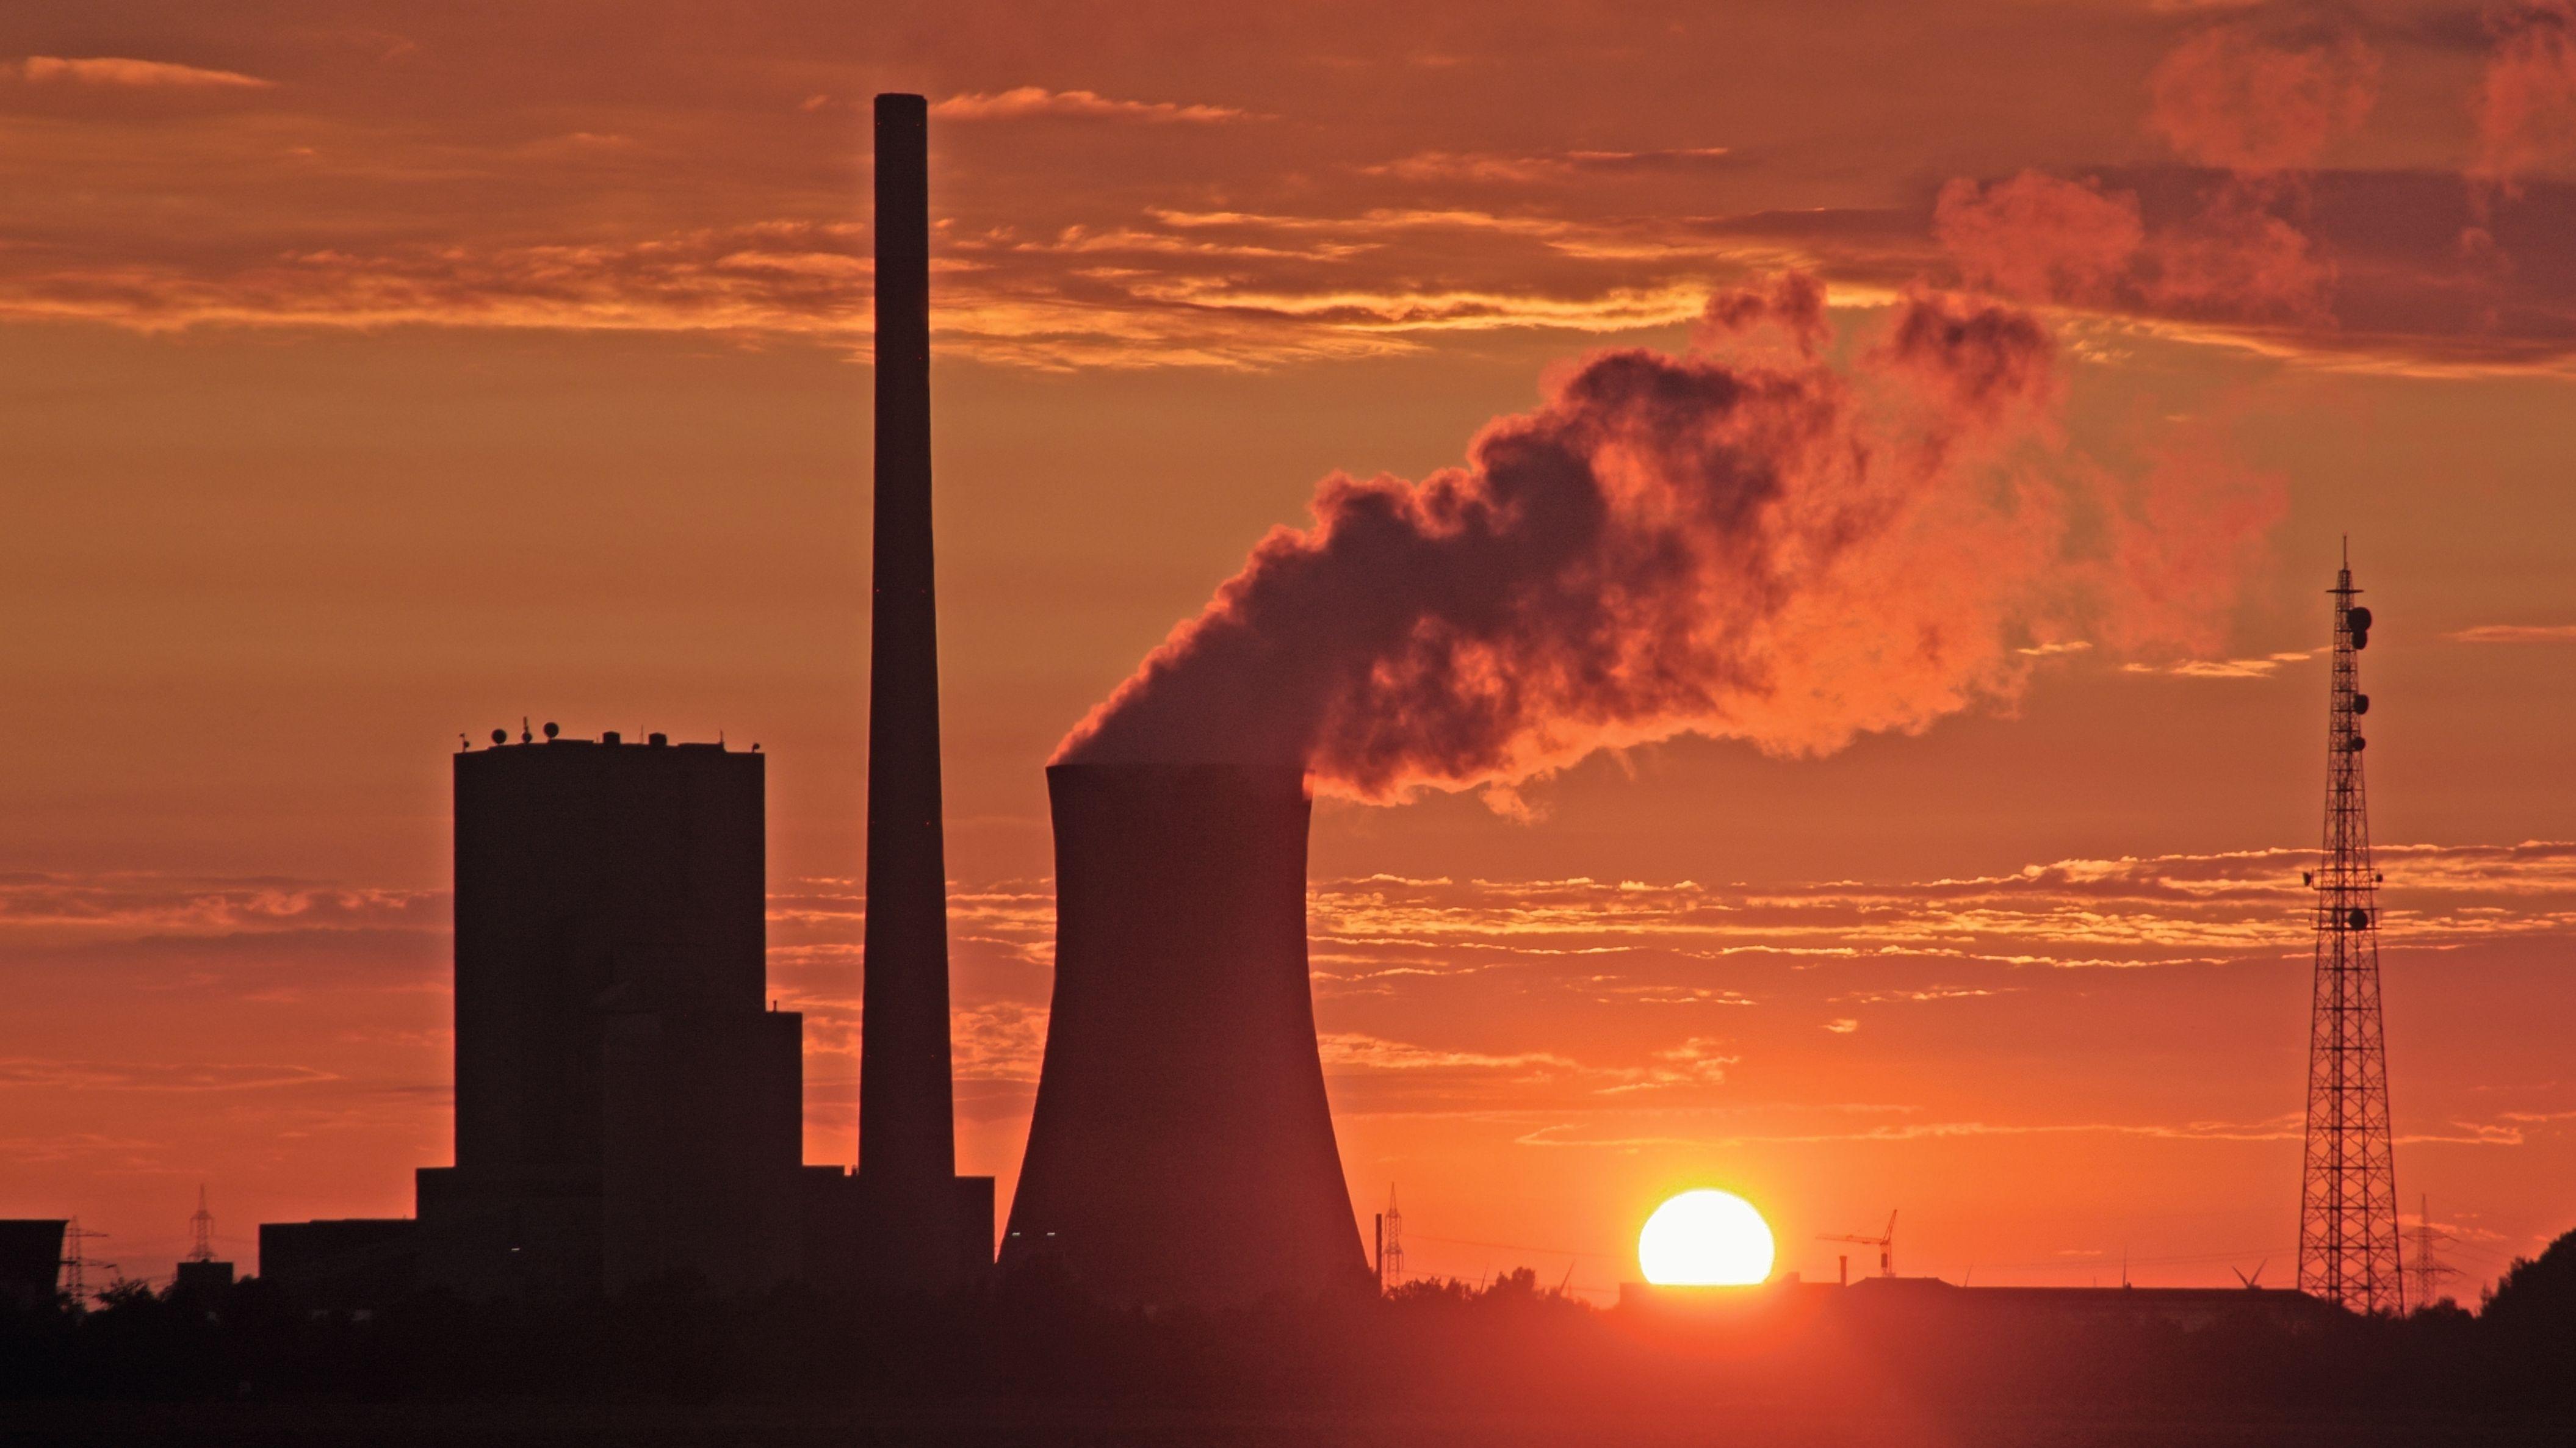 Kohlekraftwerk vor Sonnenuntergang